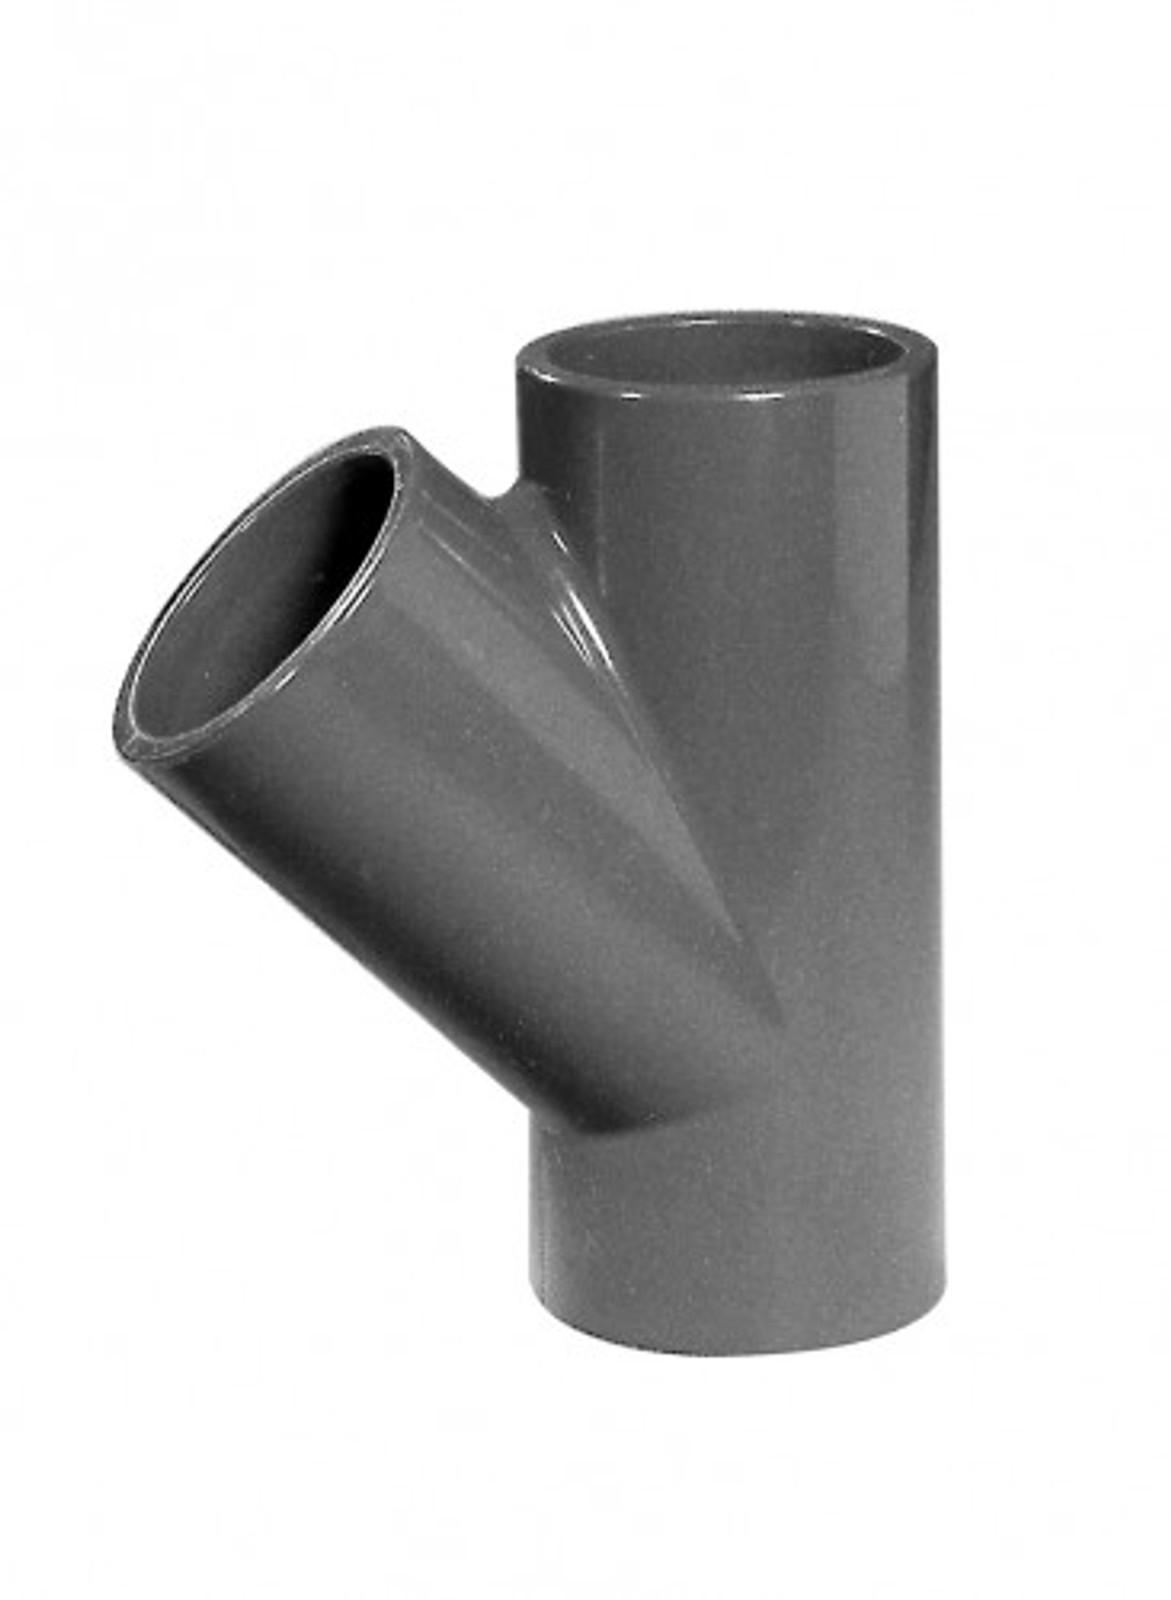 T-Stück 45°, 32 mm aus PVC